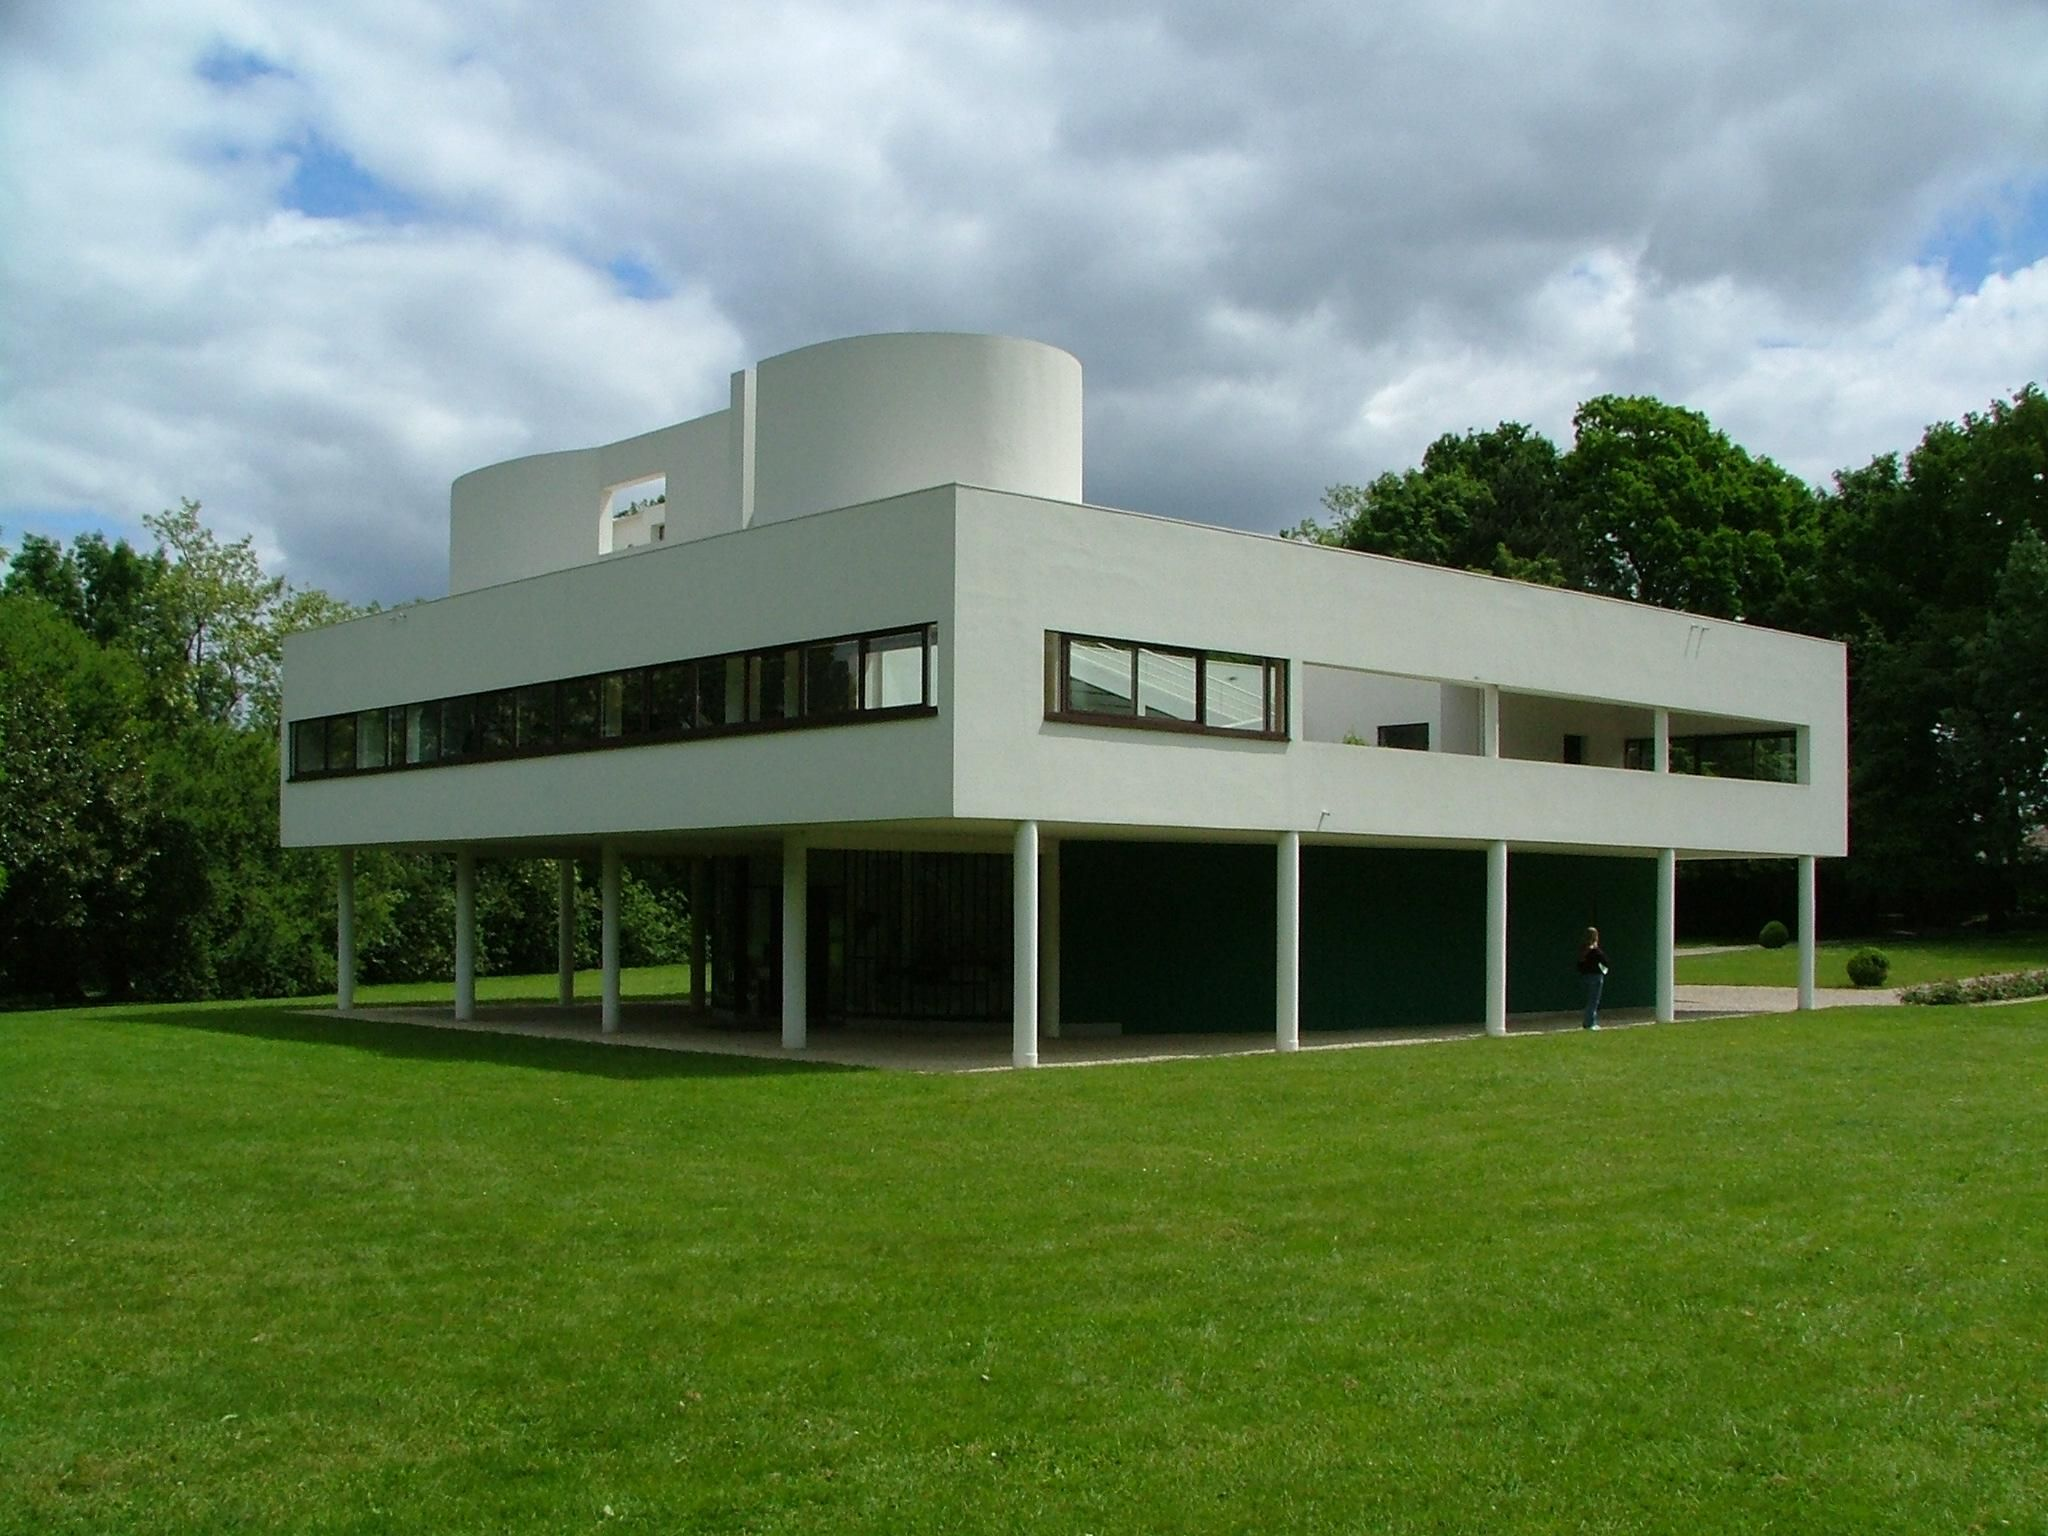 Villa savoye poissy sur seine france le corbusier for Architecture le corbusier